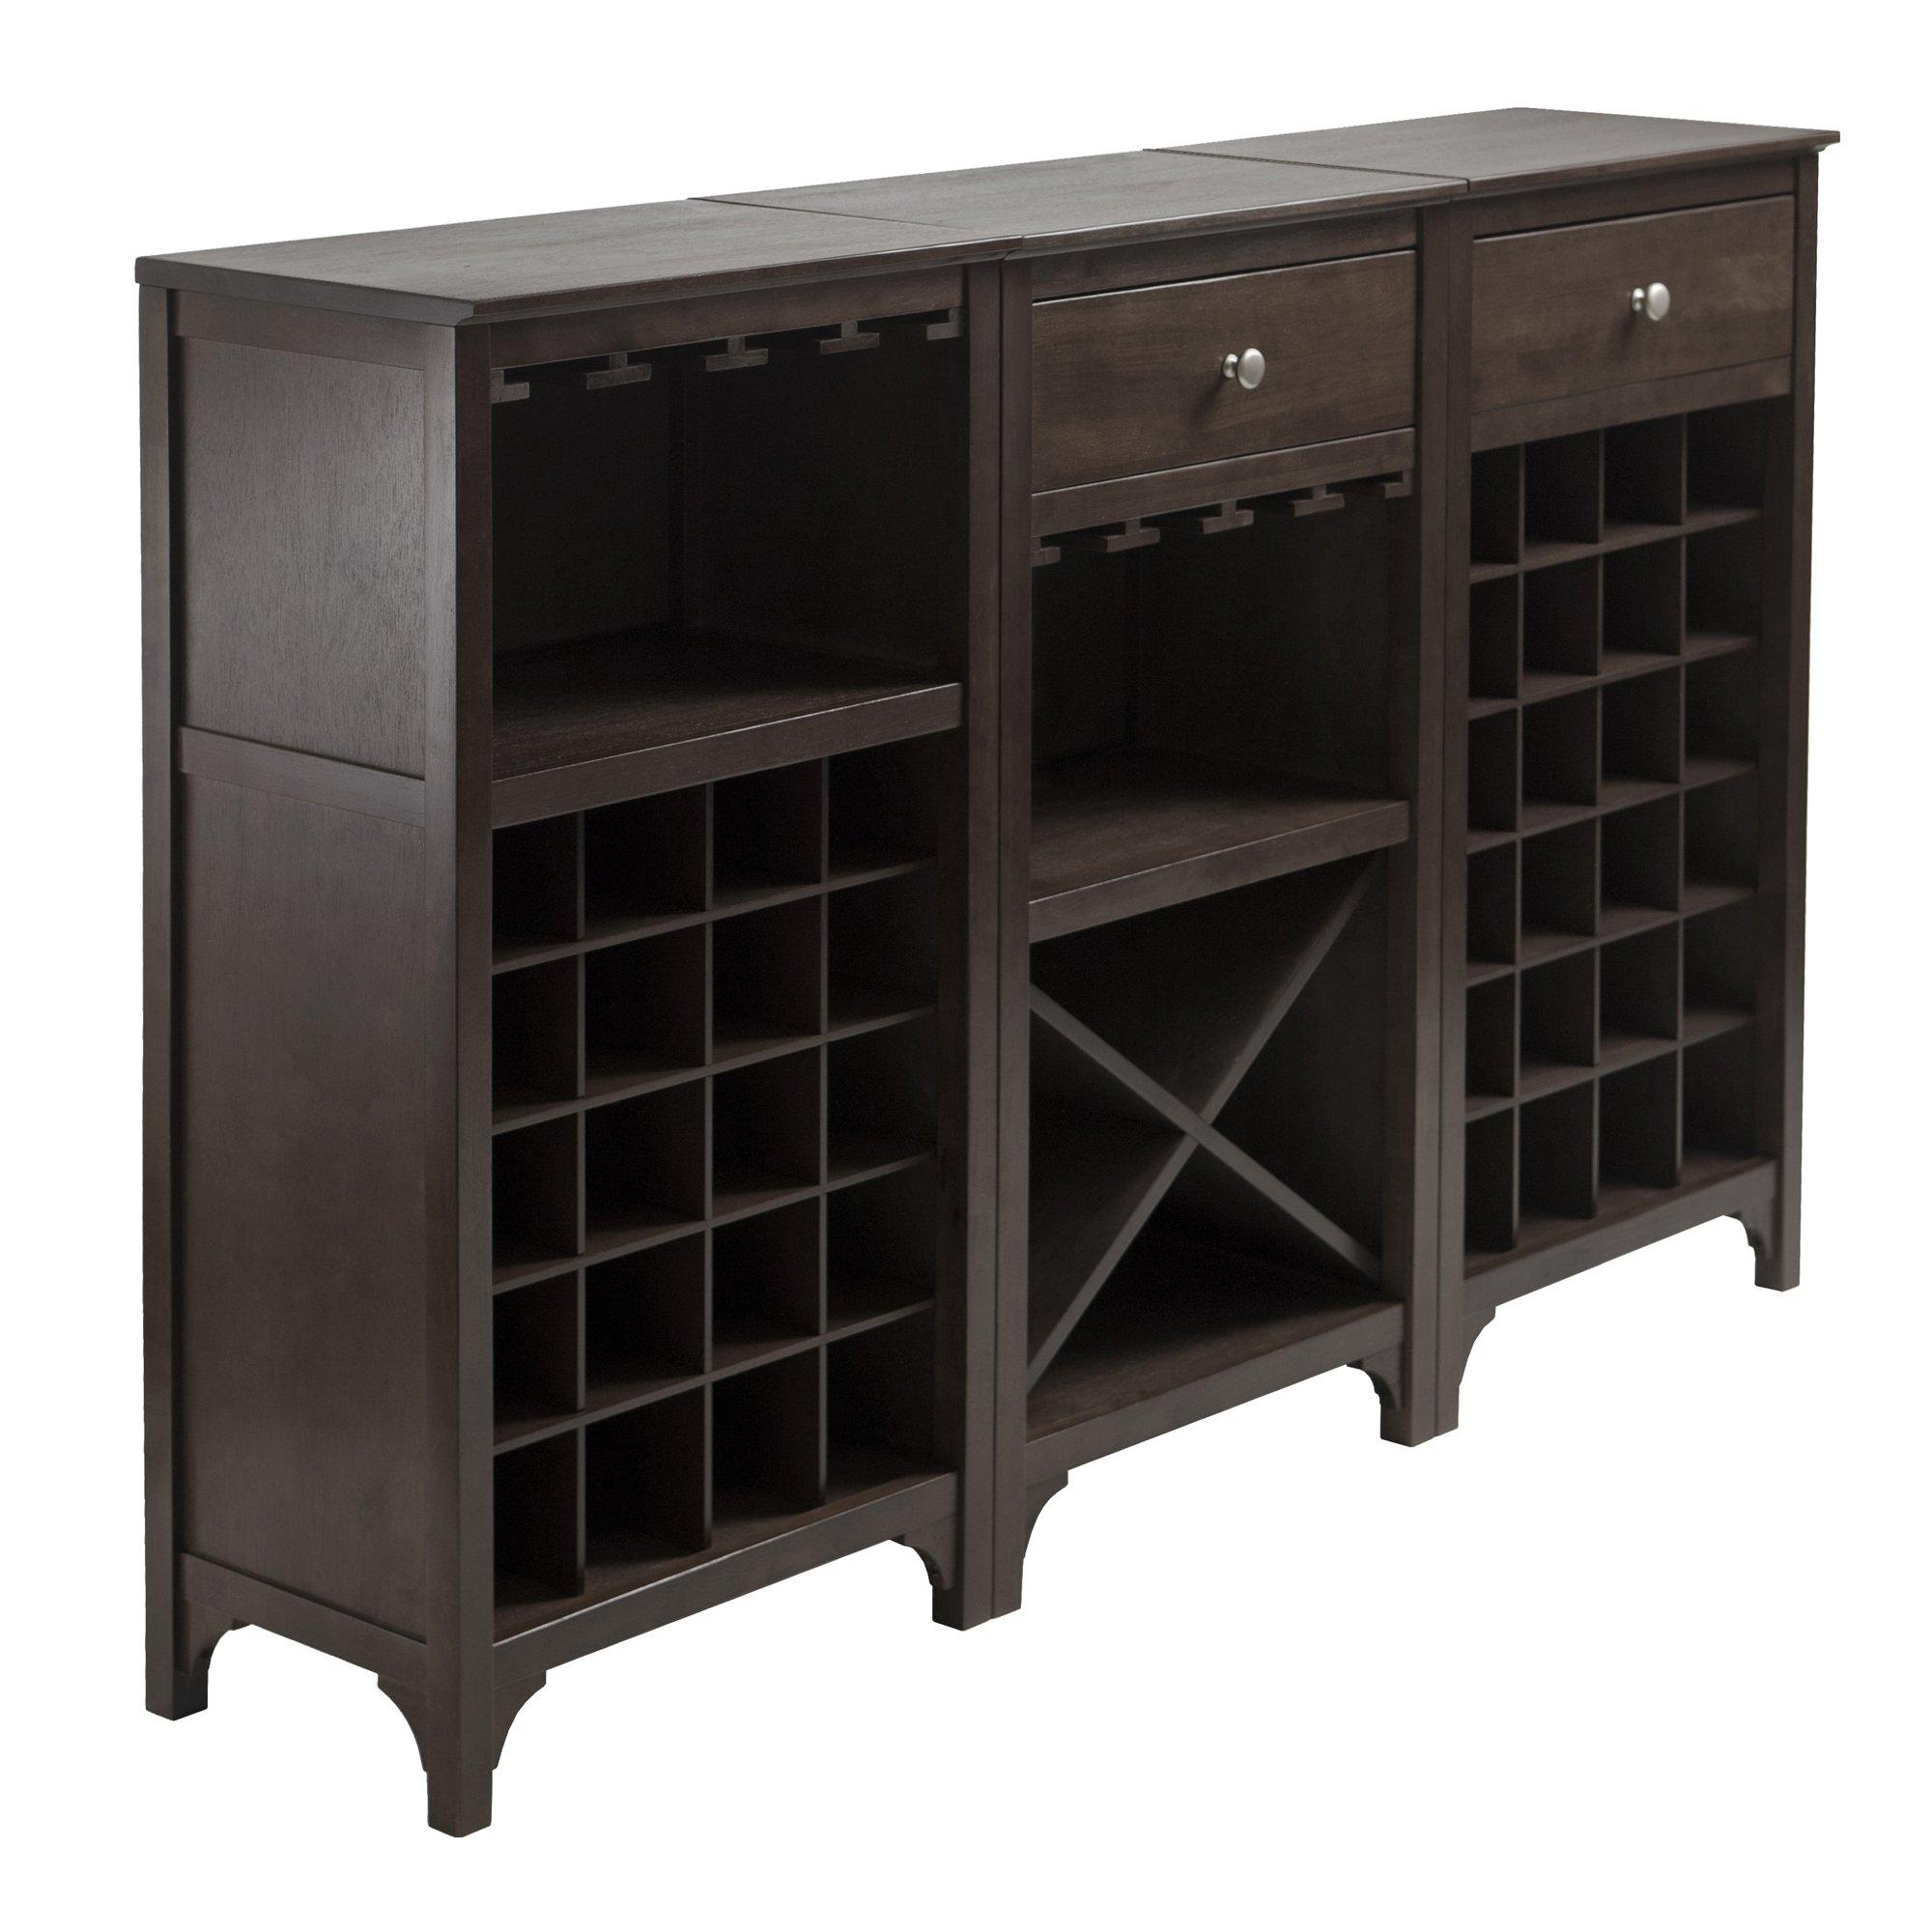 Winsome 3-Piece Ancona Wine Cabinet Modular Set, Black by Winsome